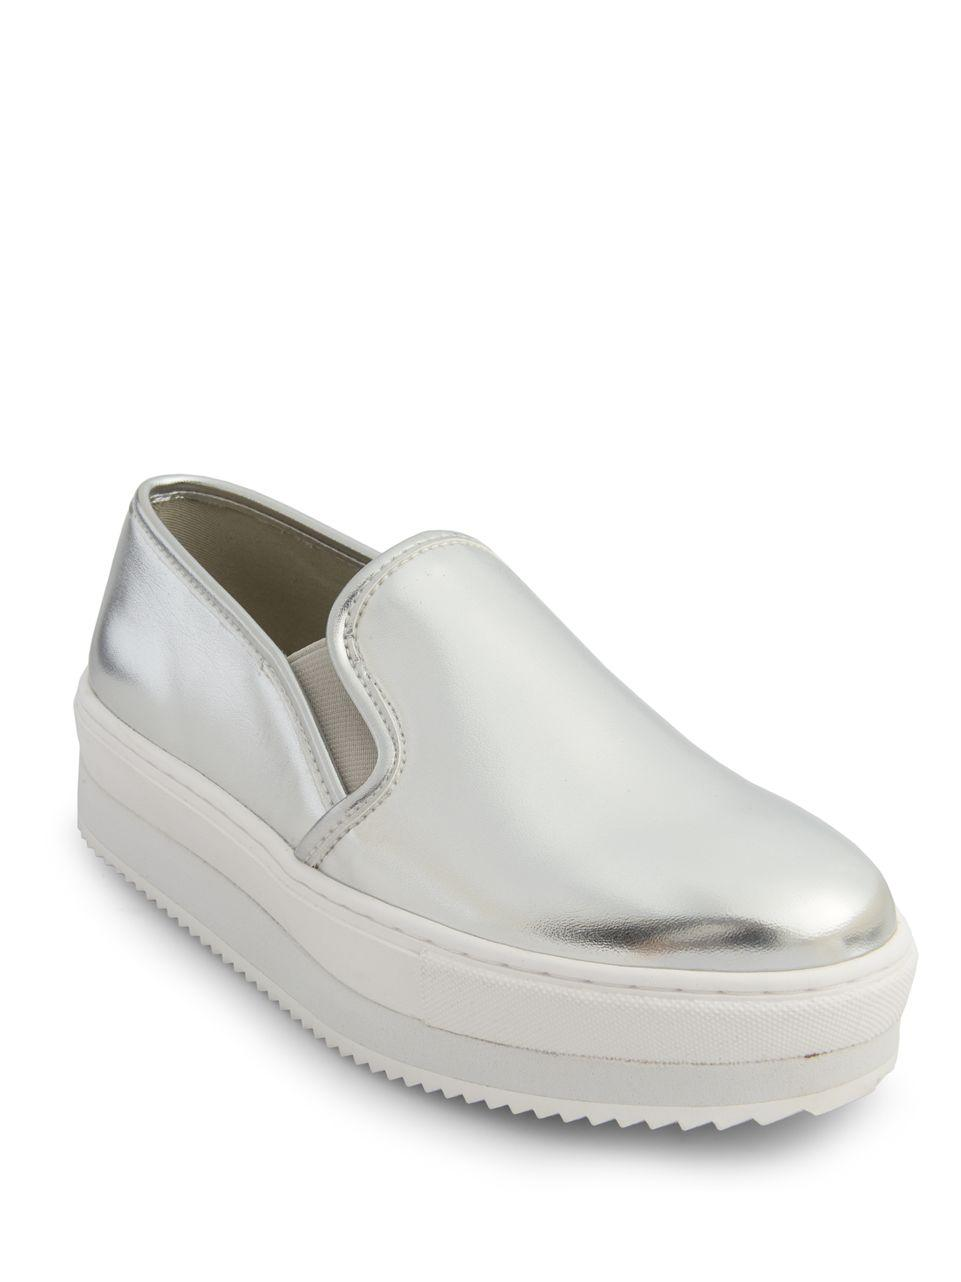 Are Steve Madden Slip On Shoes Comfortable